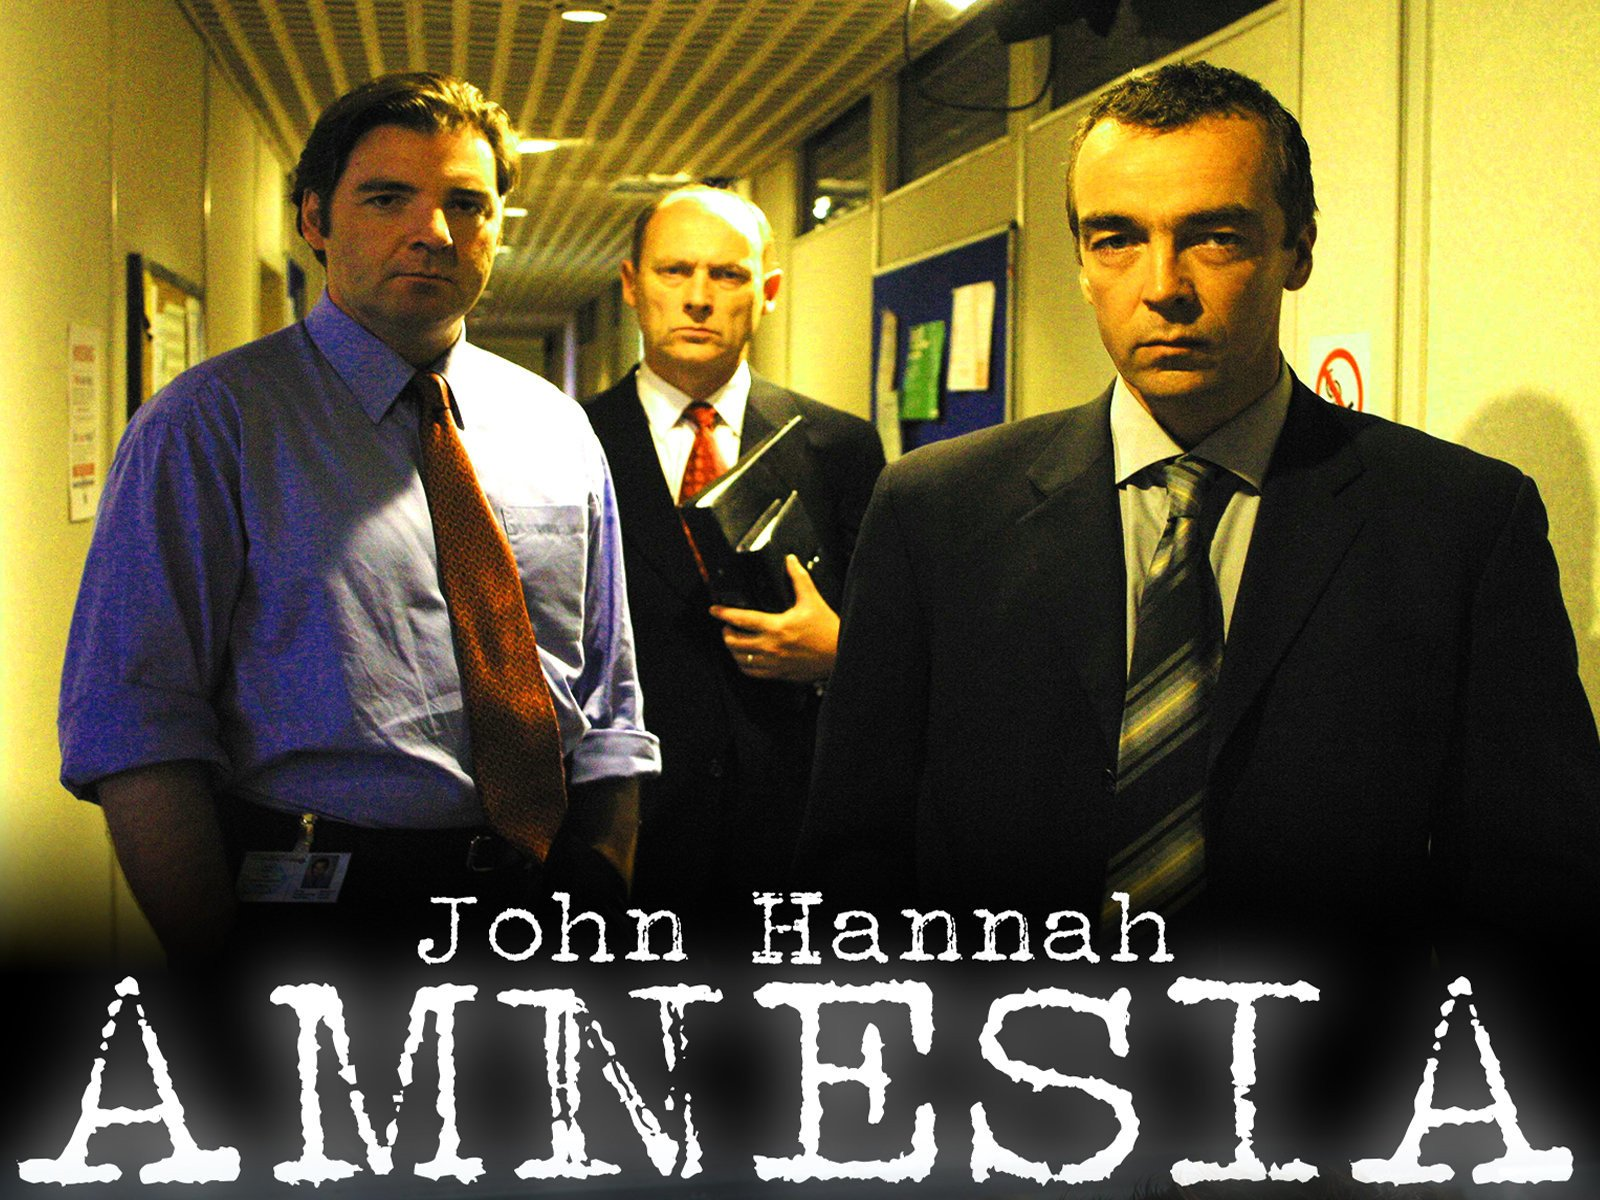 Amazon.com: Amnesia: John Hannah, Jemma Redgrave, Anthony Calf ...